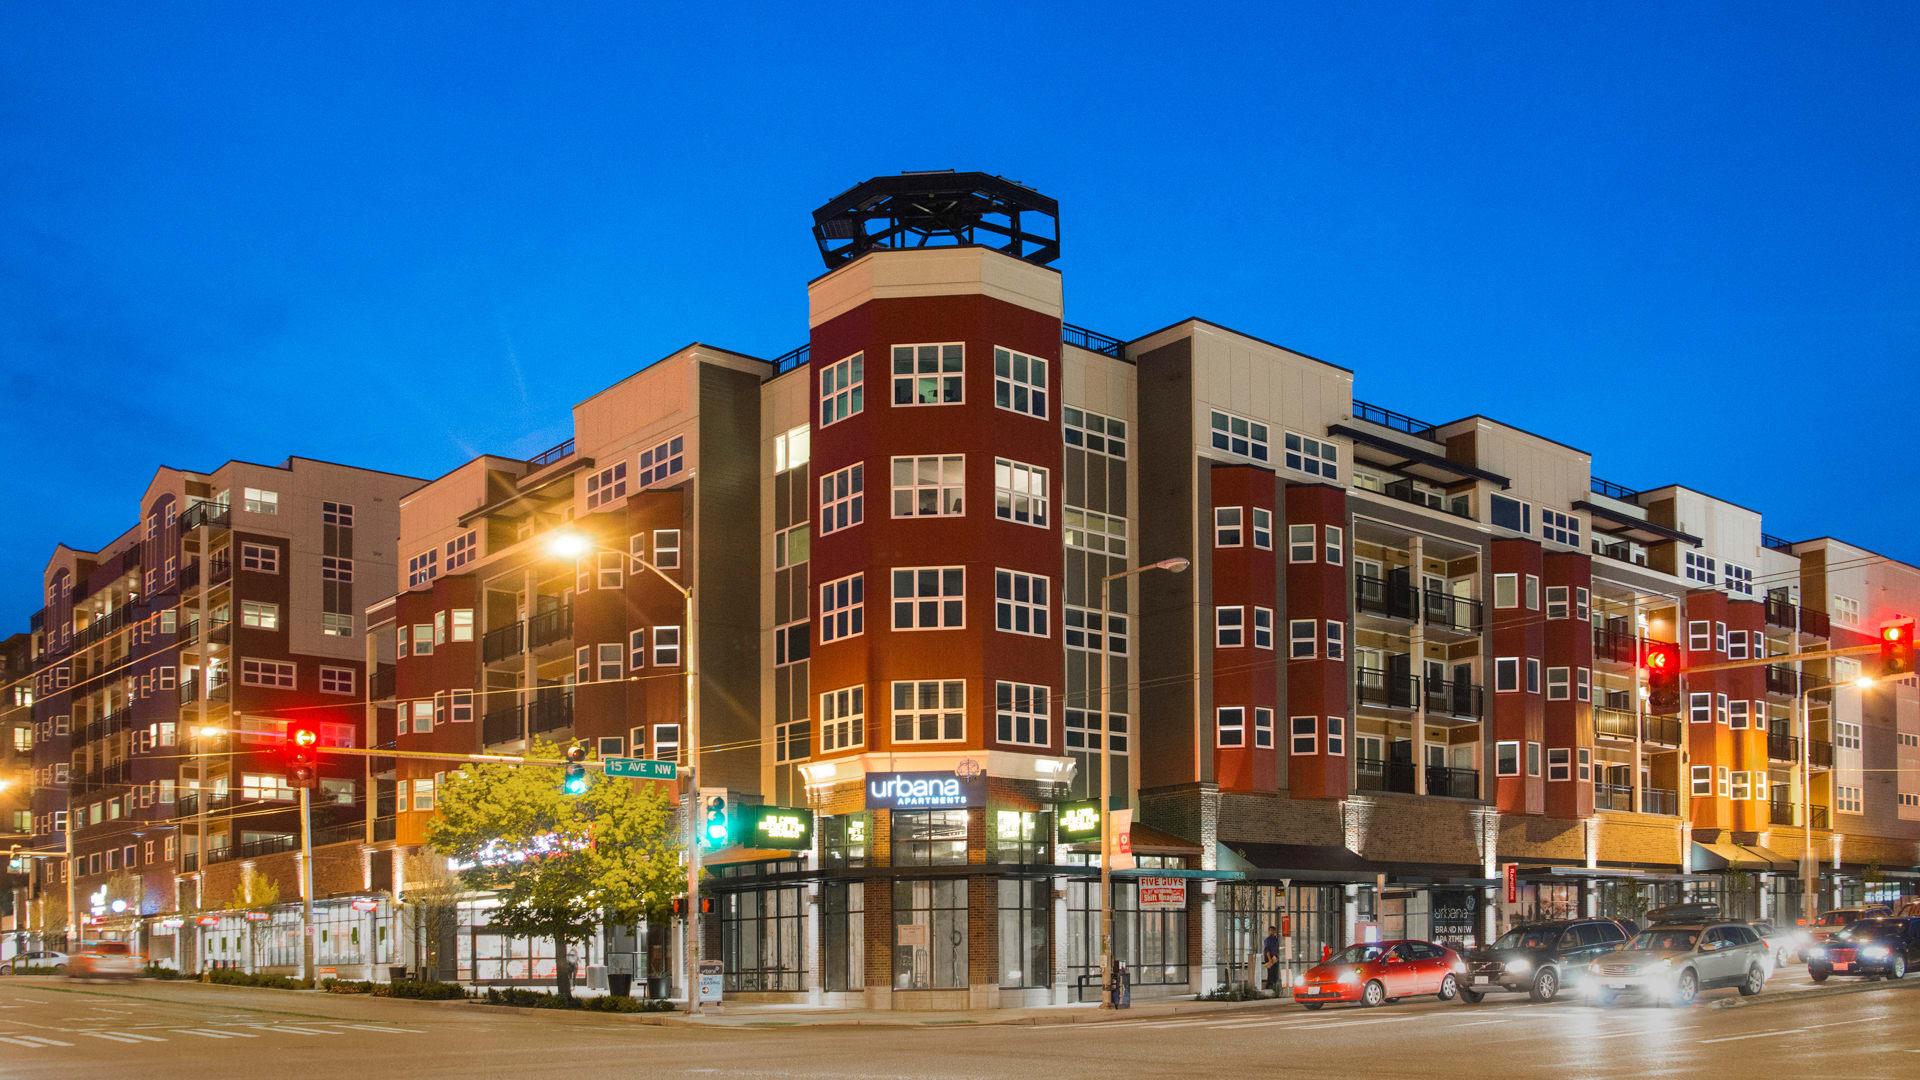 Urbana Apartments - Exterior